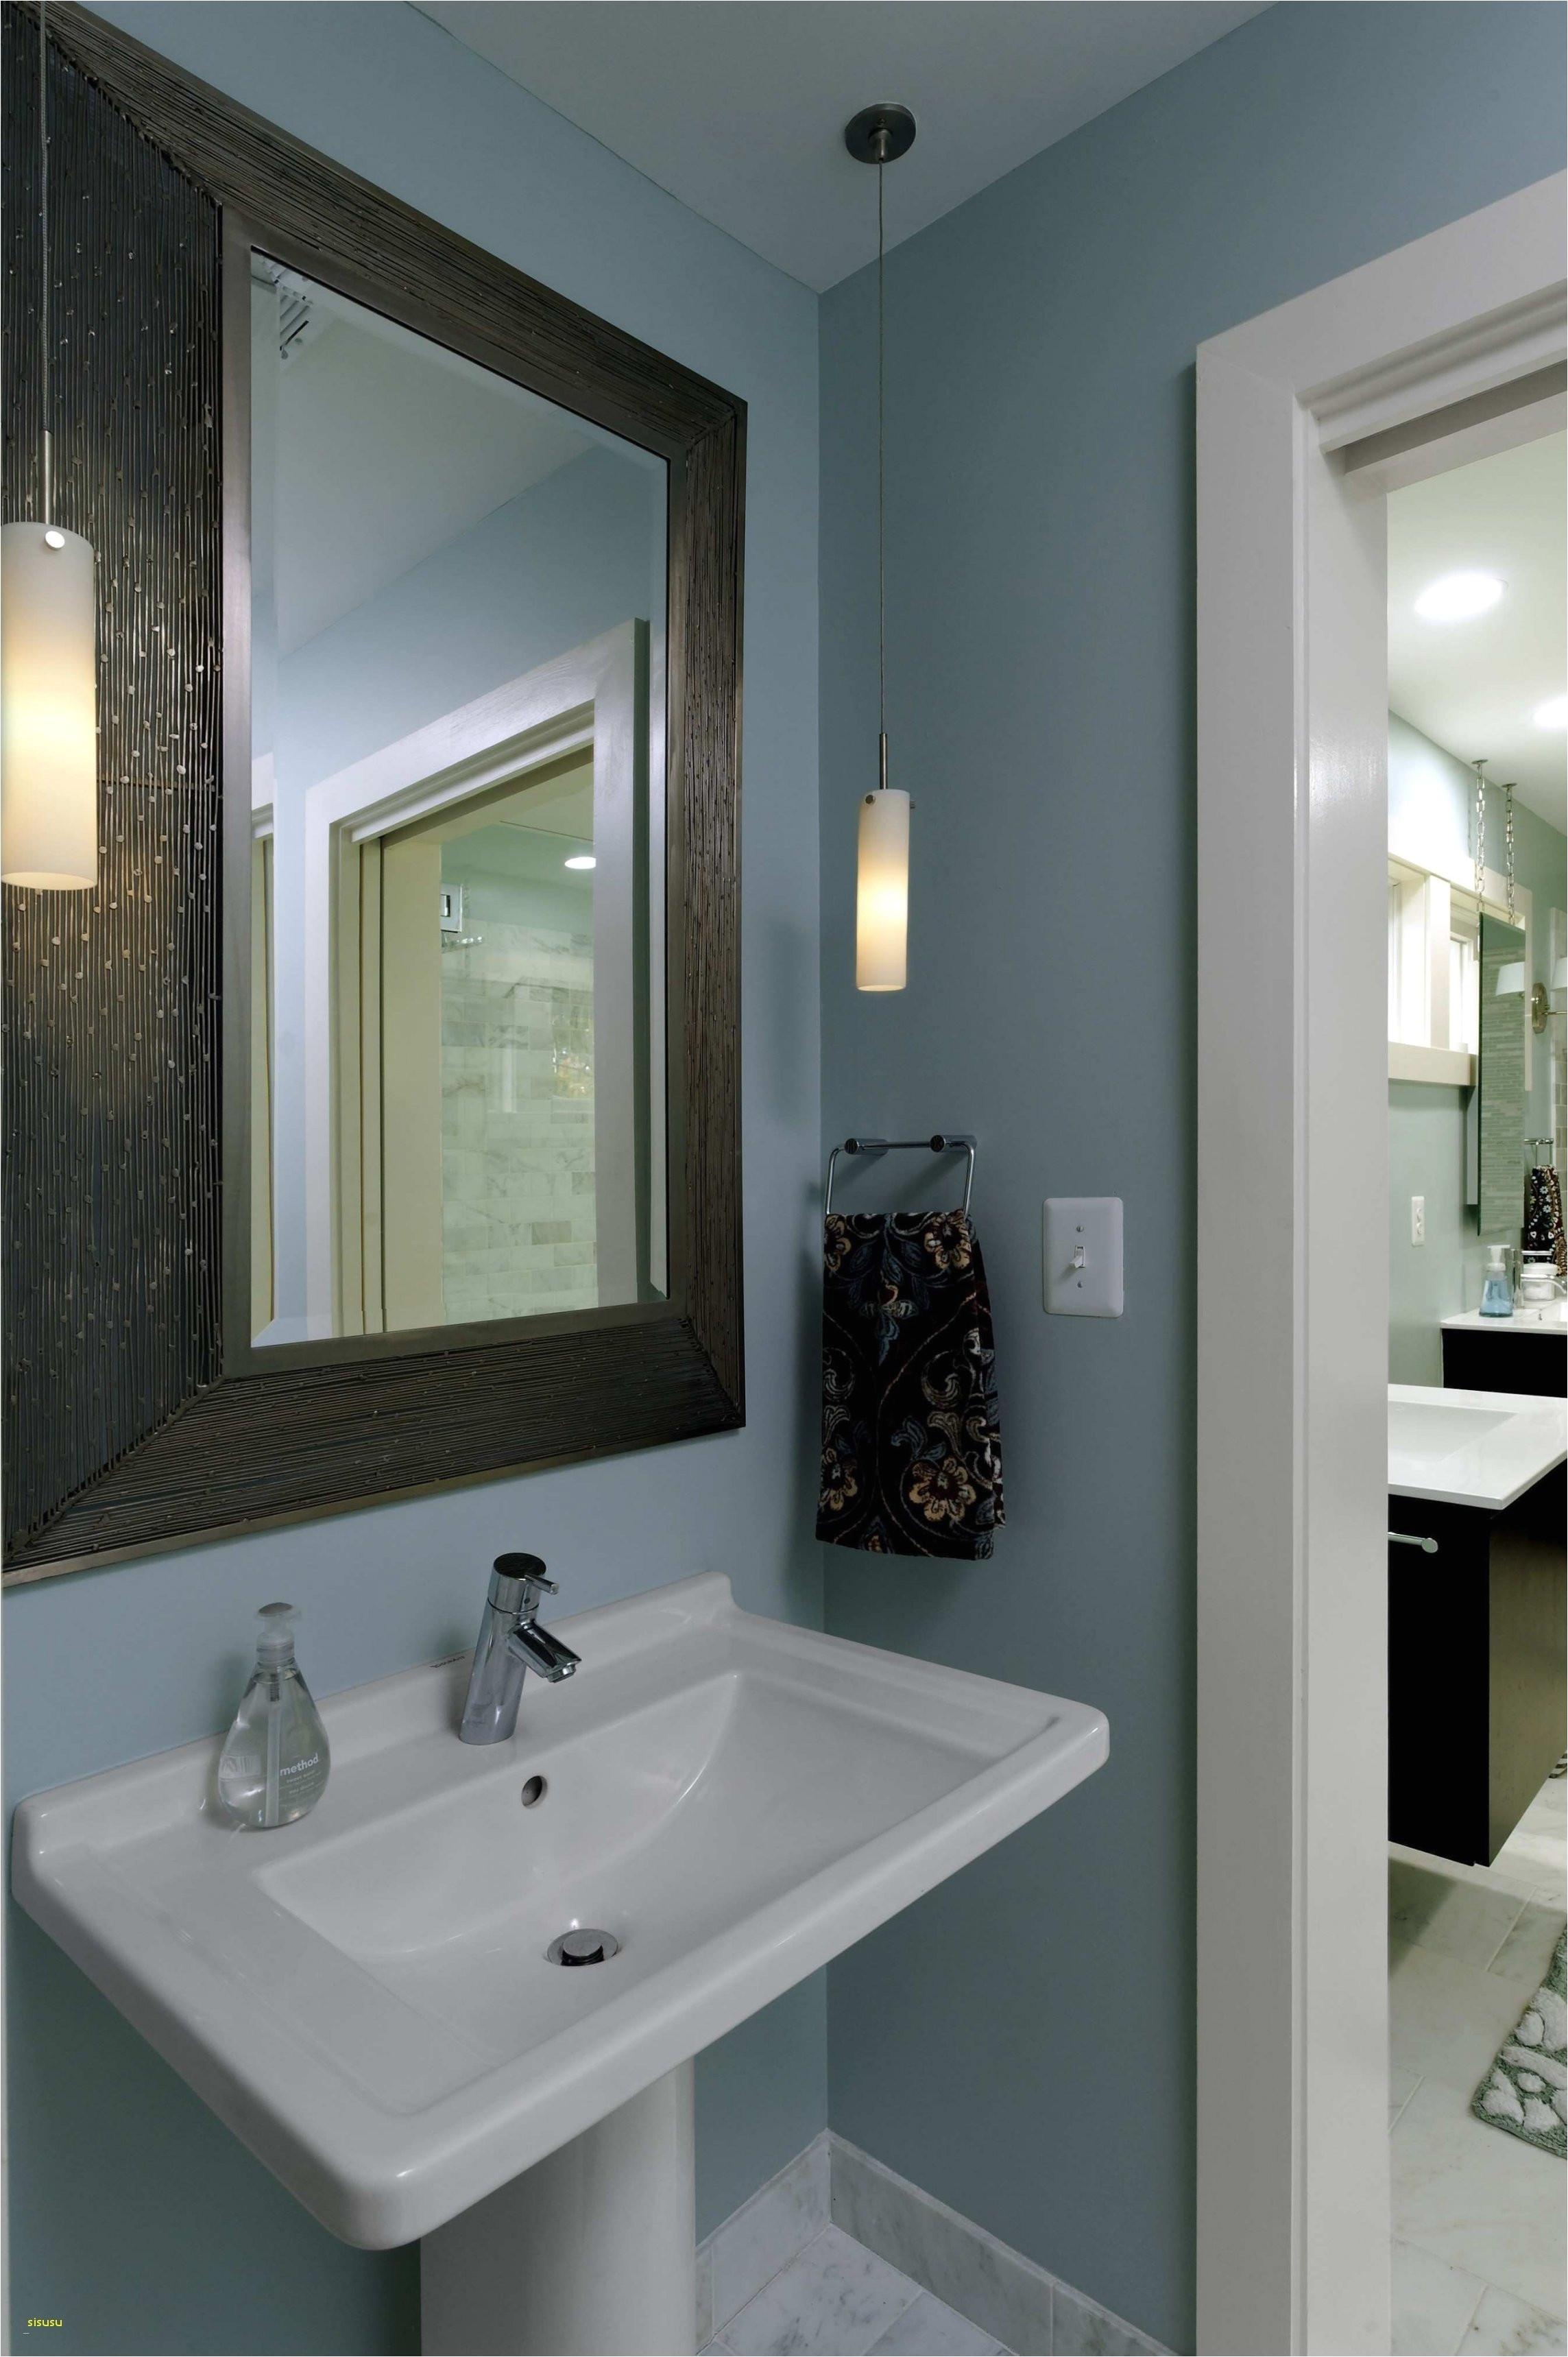 black bathroom vanity light fresh bathroom shower light new h sink install bathroom i 0d exciting